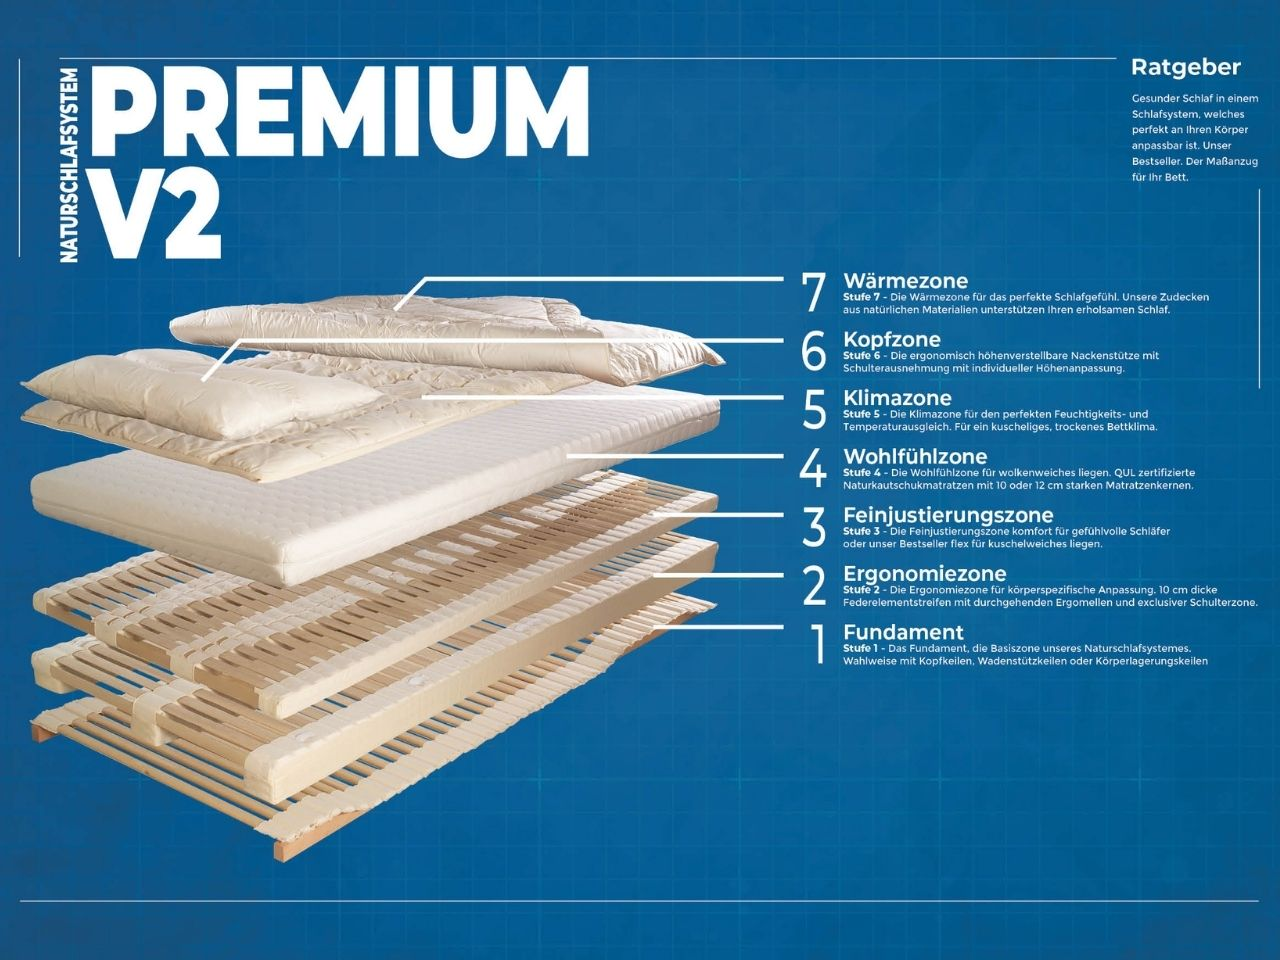 schlafsystem-premium-v2